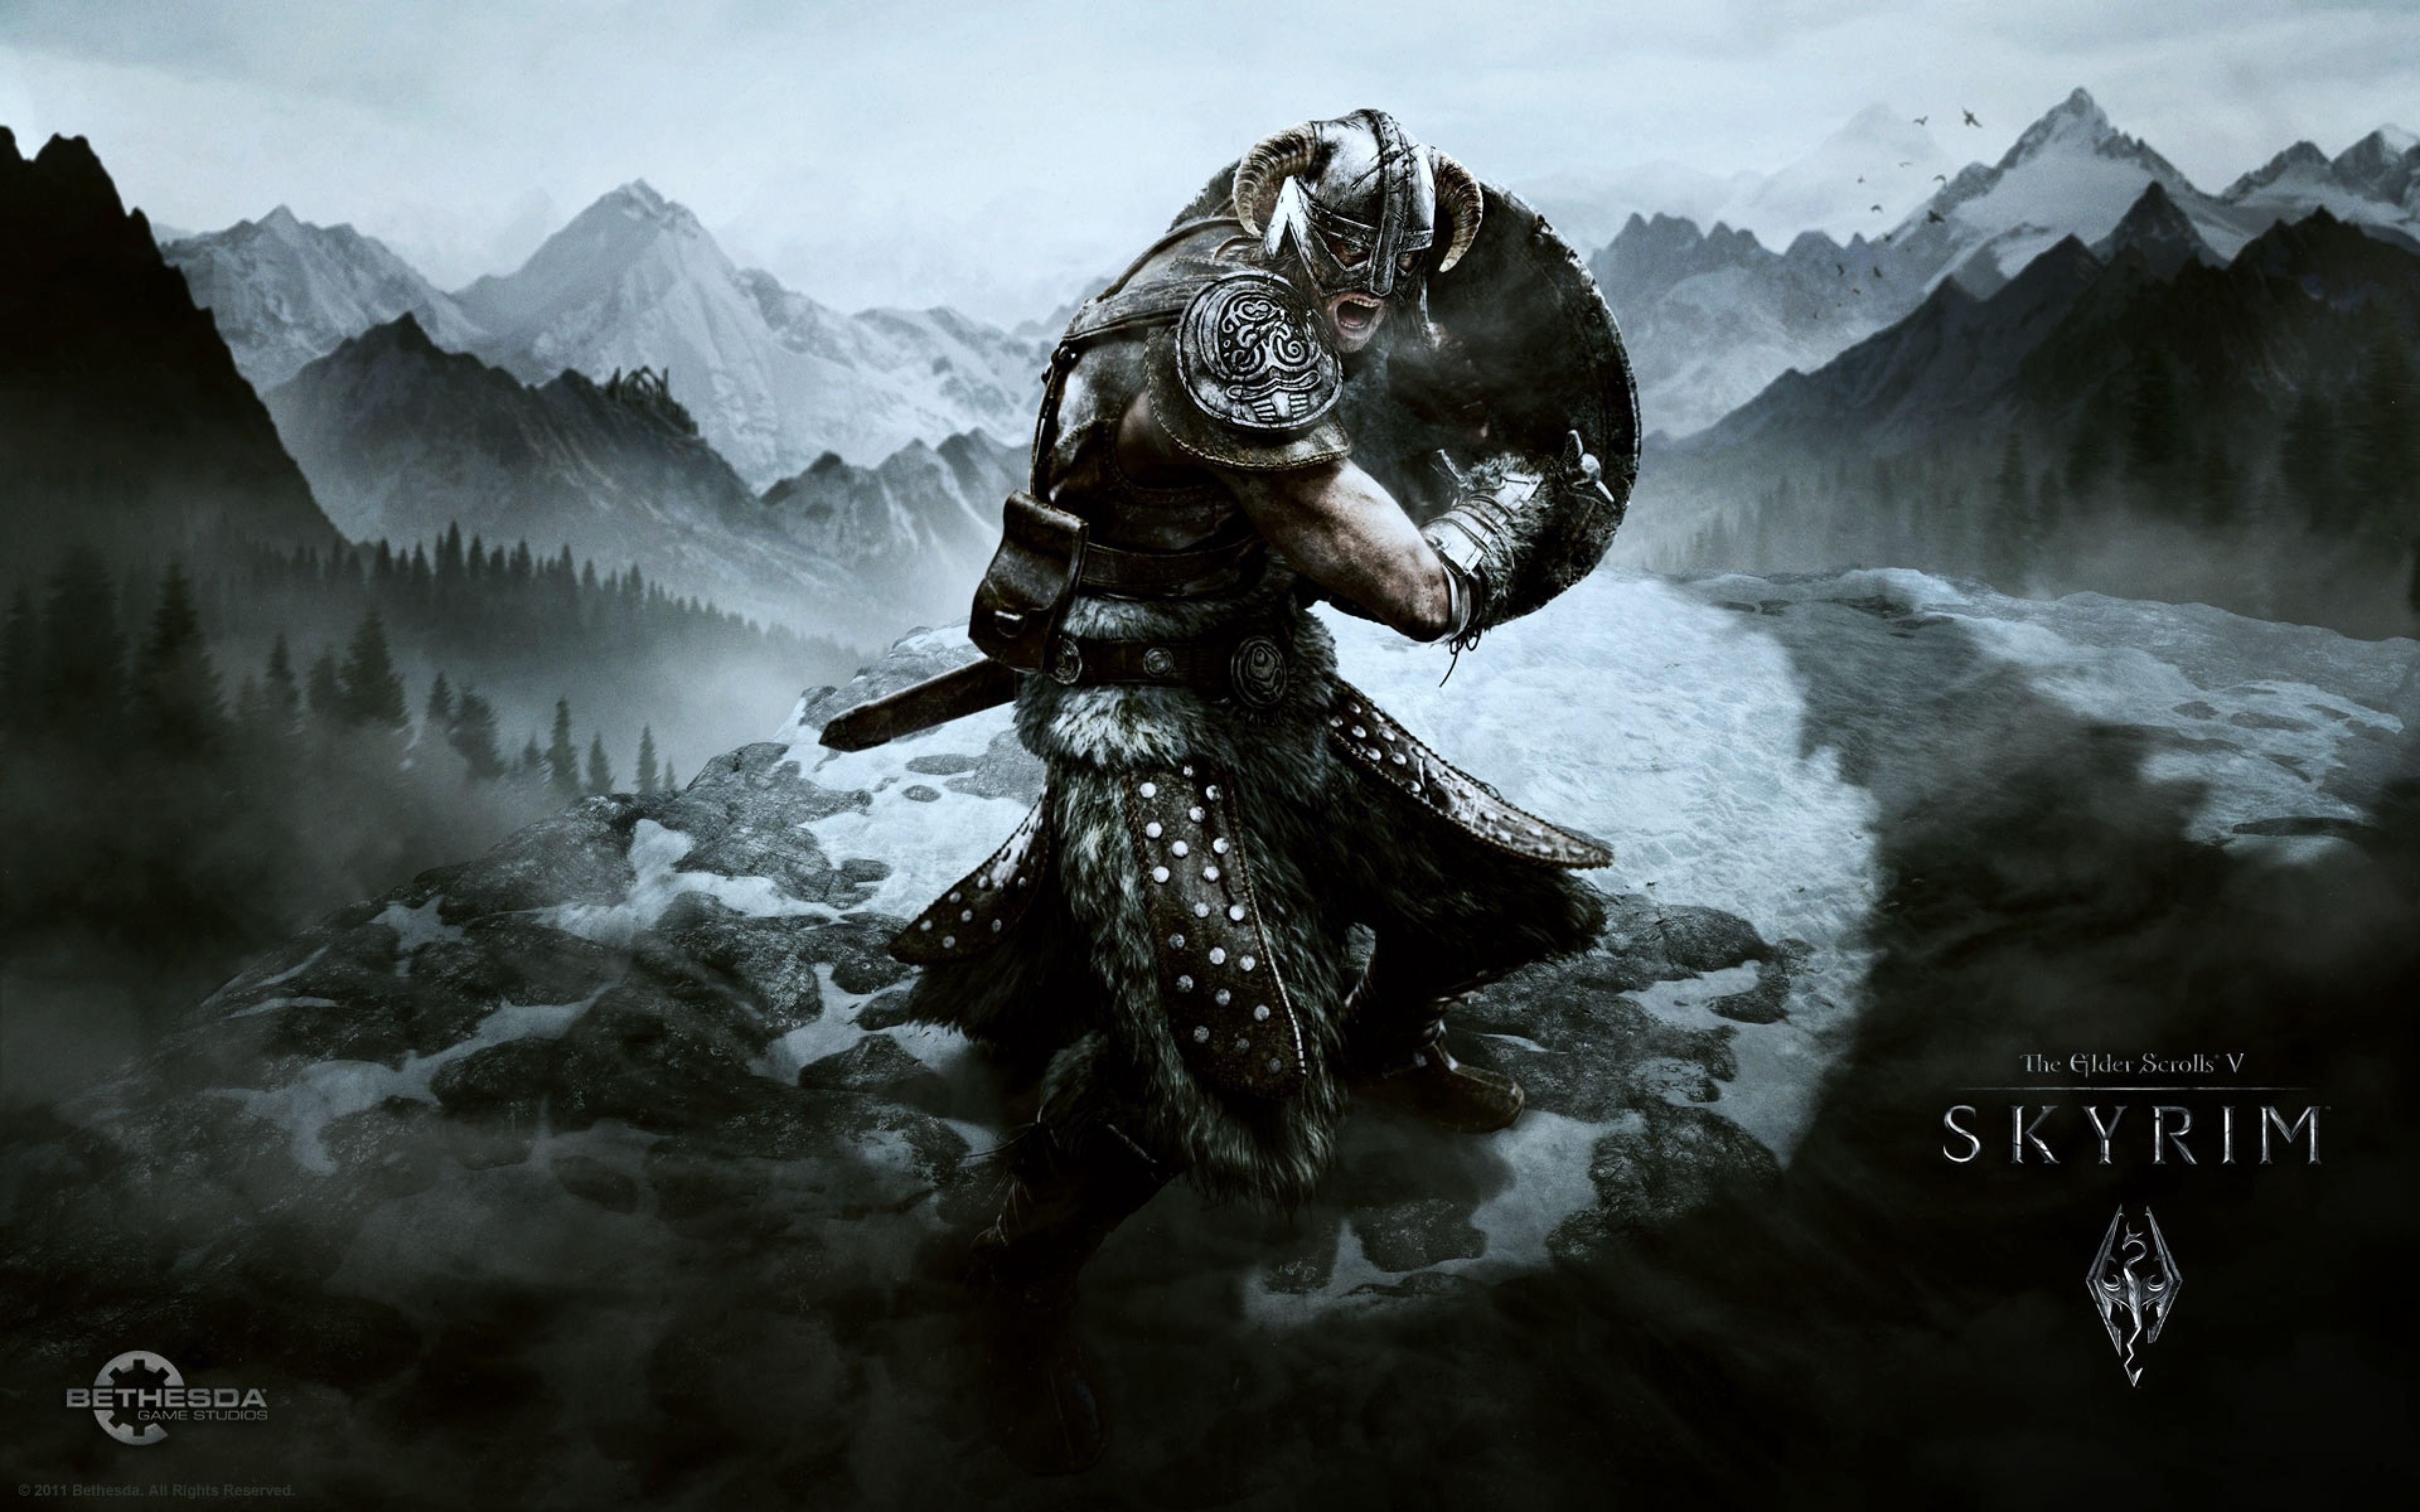 The Elder Scrolls V Skyrim Wallpapers Wallpaper Cave